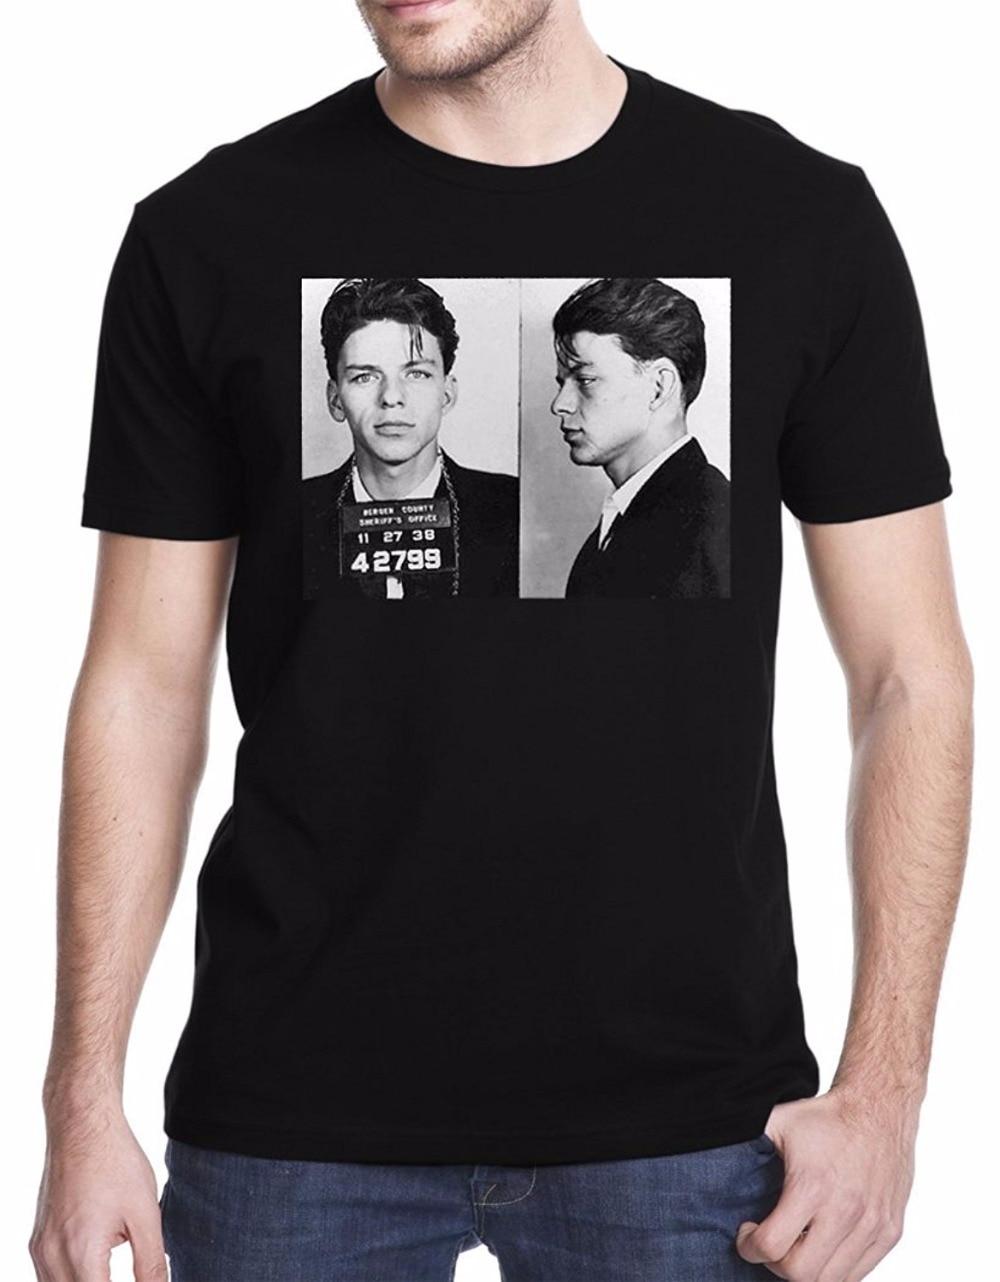 New FRANK SINATRA Classic Music Legend Men/'s Black T-Shirt Size S M L XL 2XL 3XL